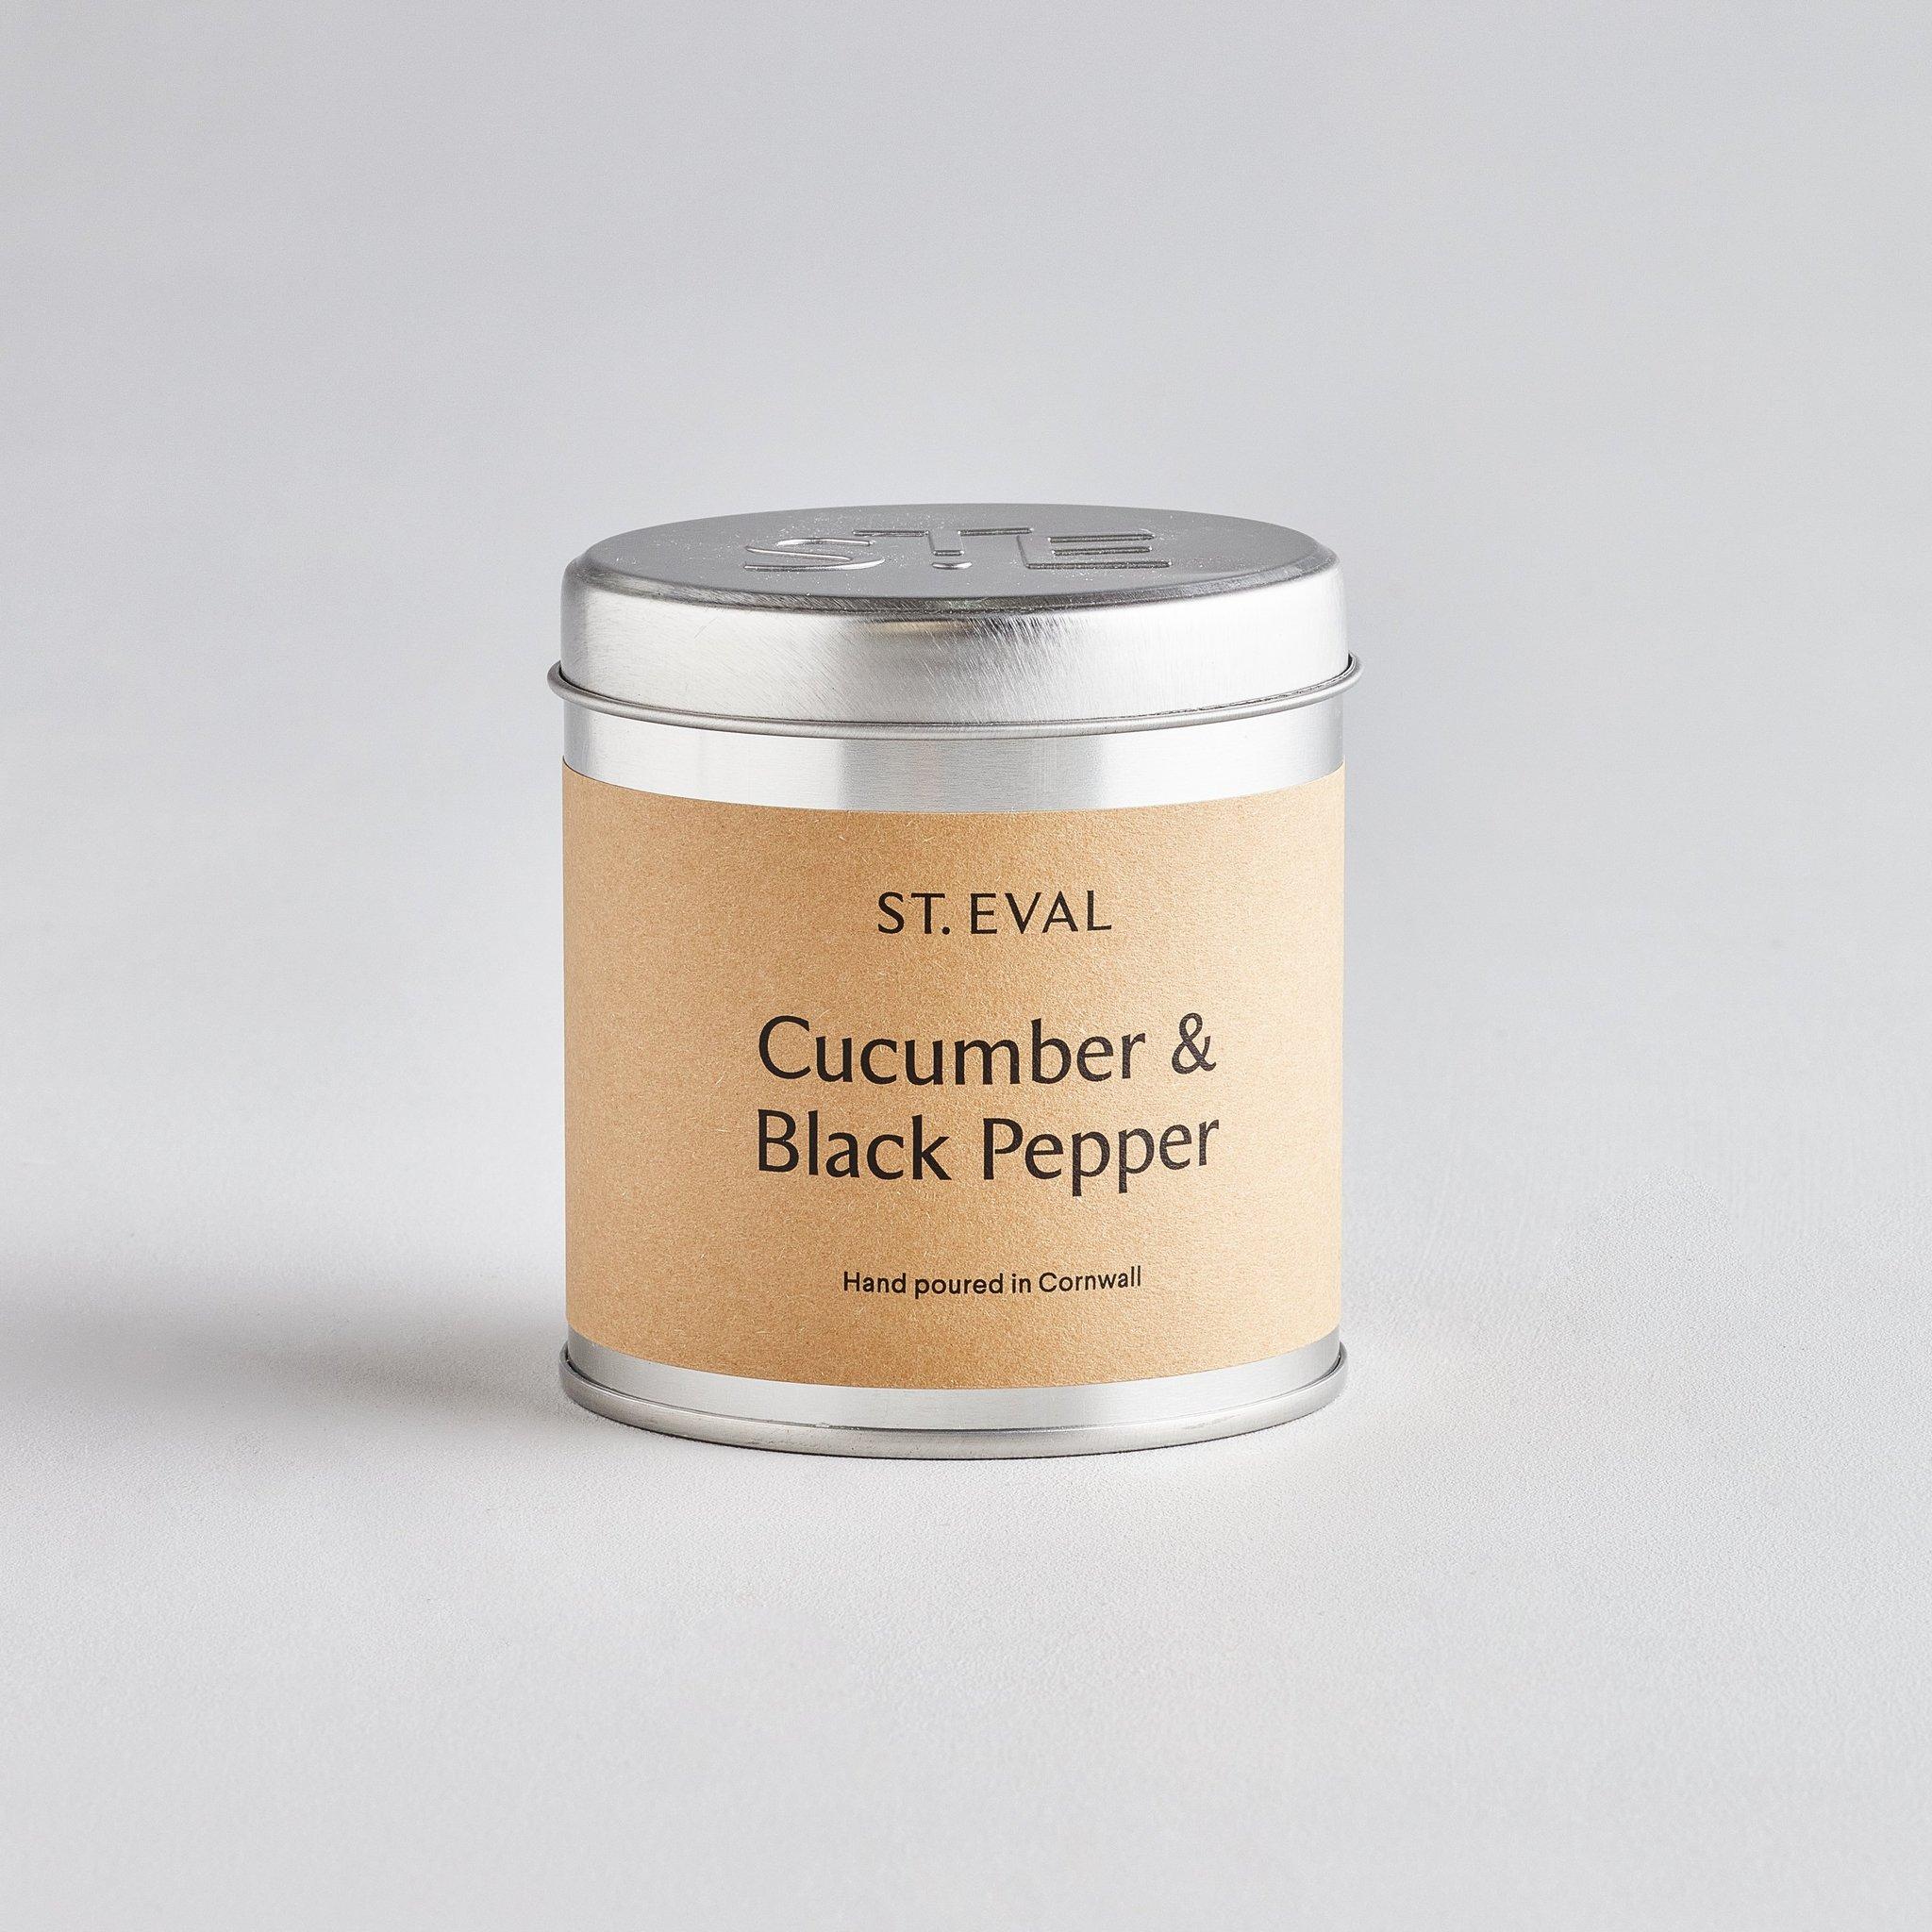 St Eval Candle Tin - Cucumber & Black Pepper